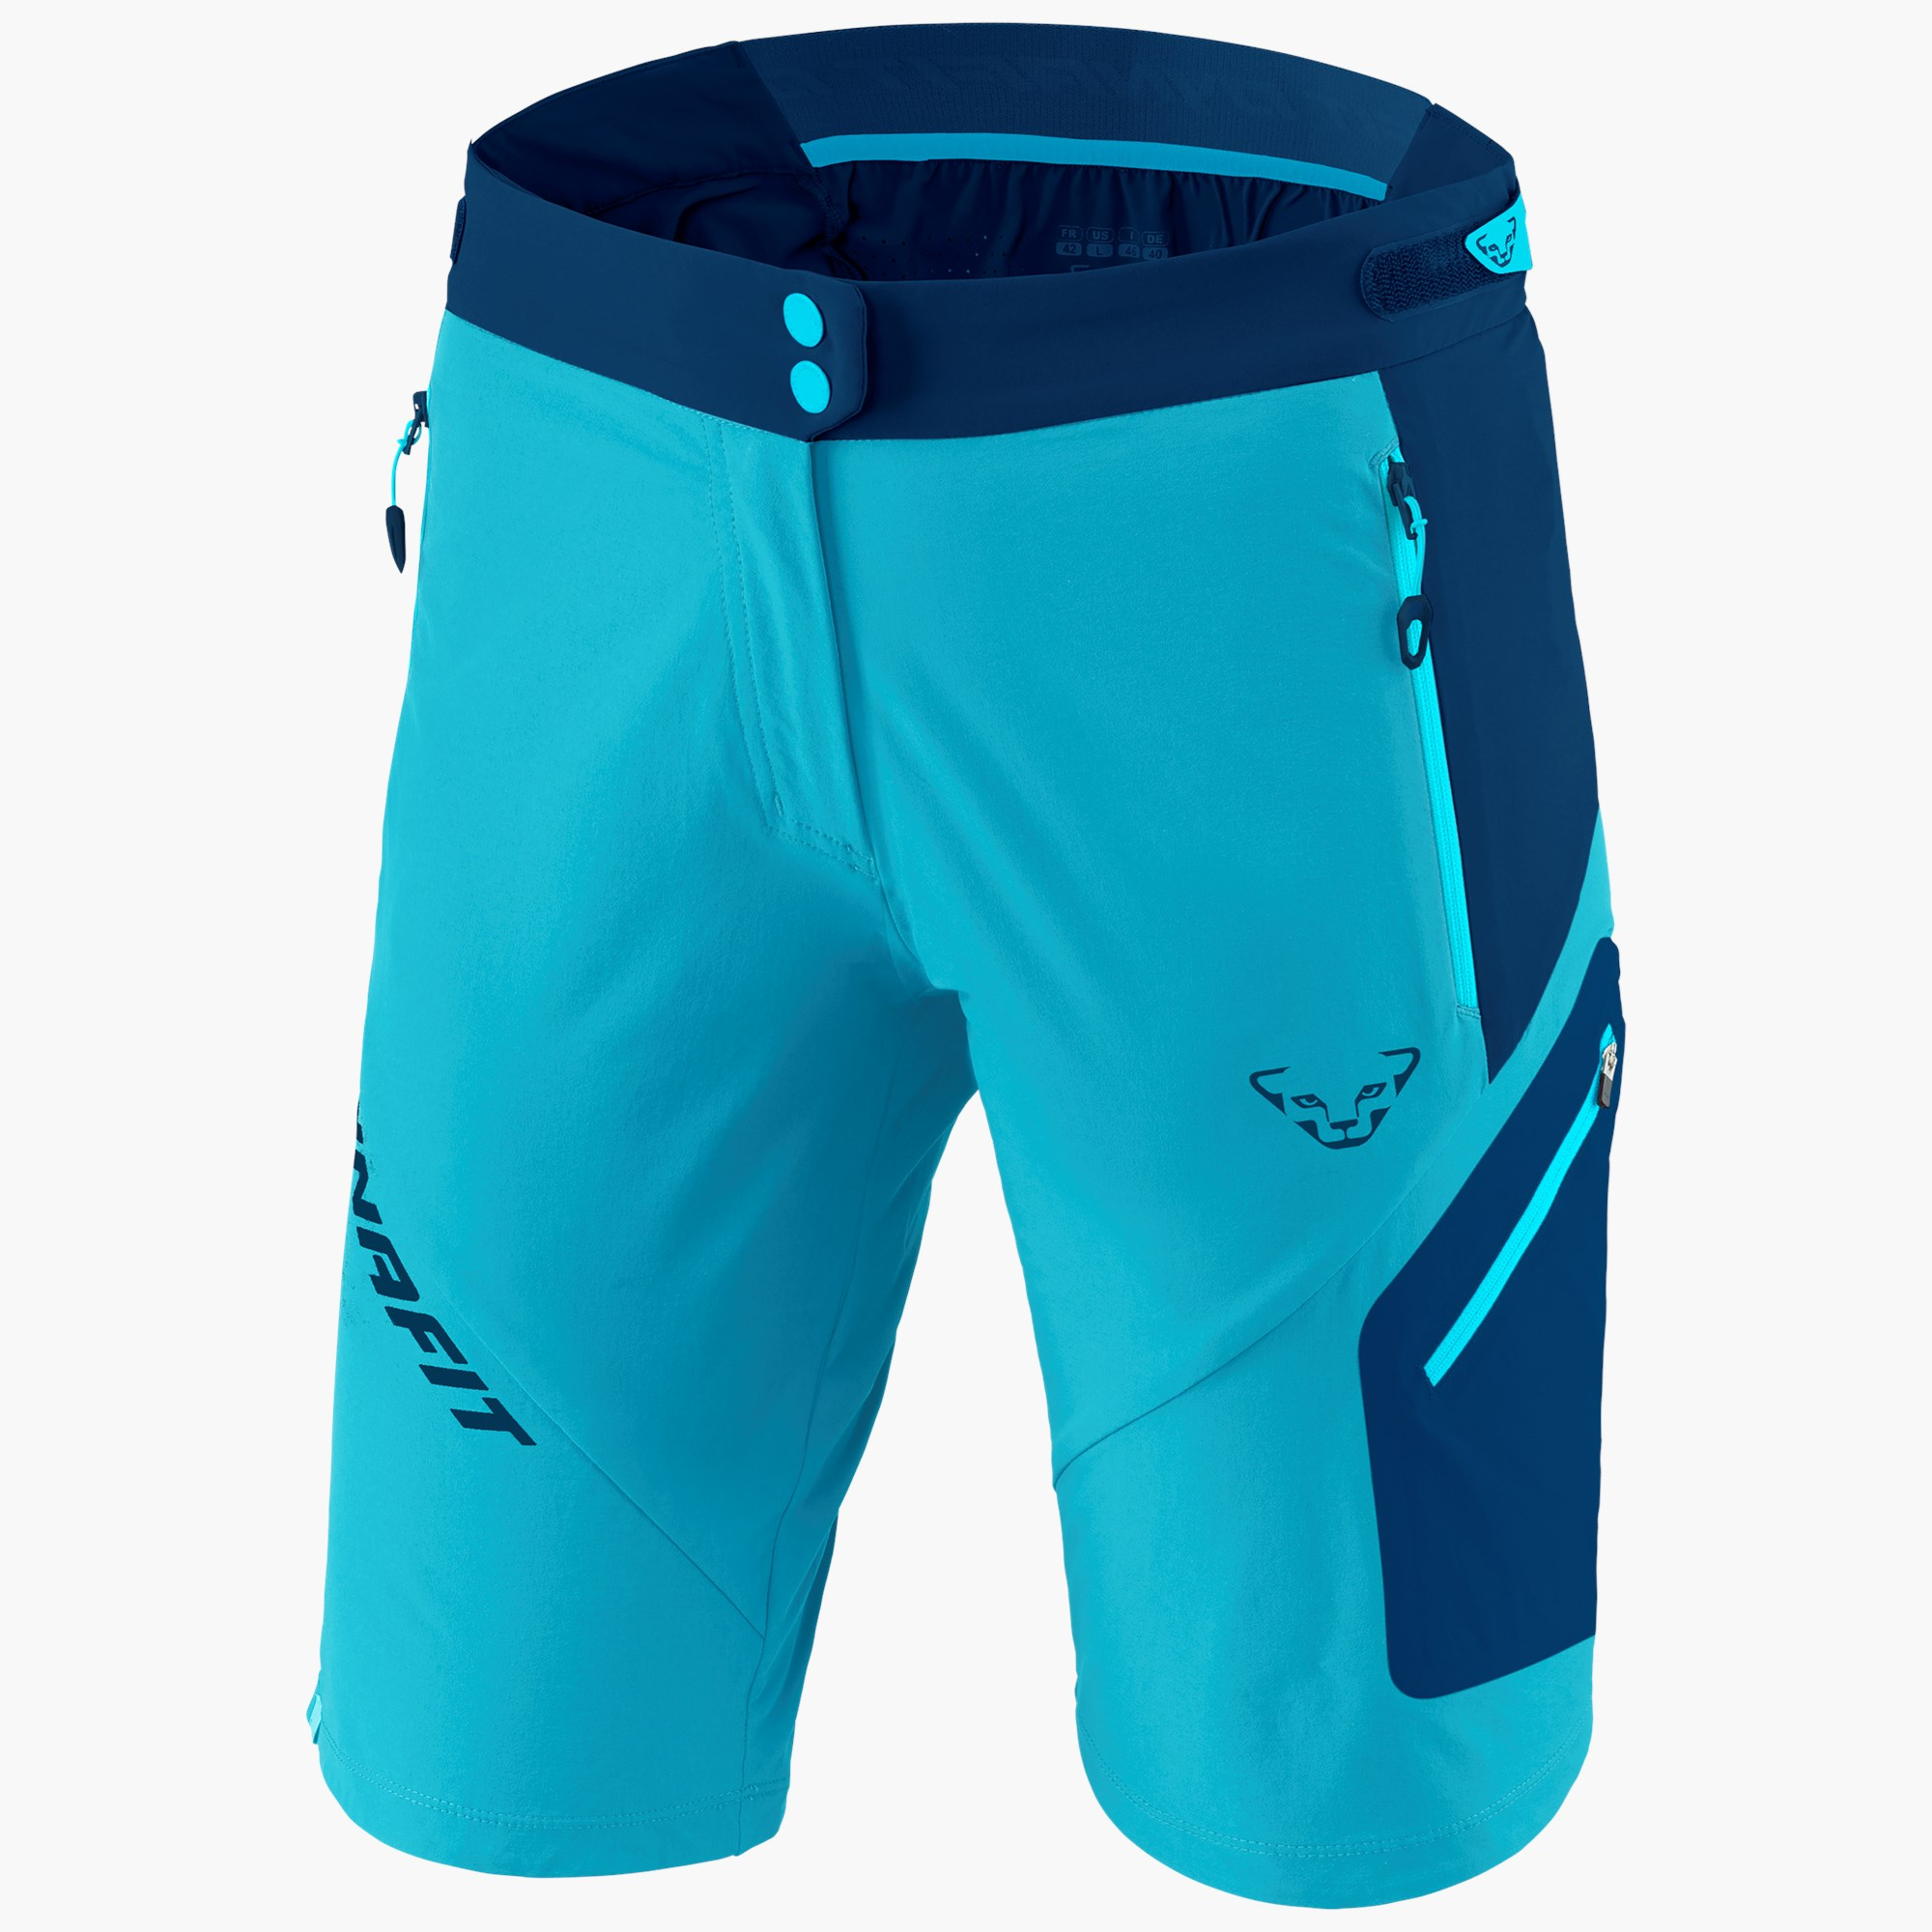 New Dynafit Transalper Durastretch Softshell Rouge Homme XL Randonnée Shorts PDSF $100